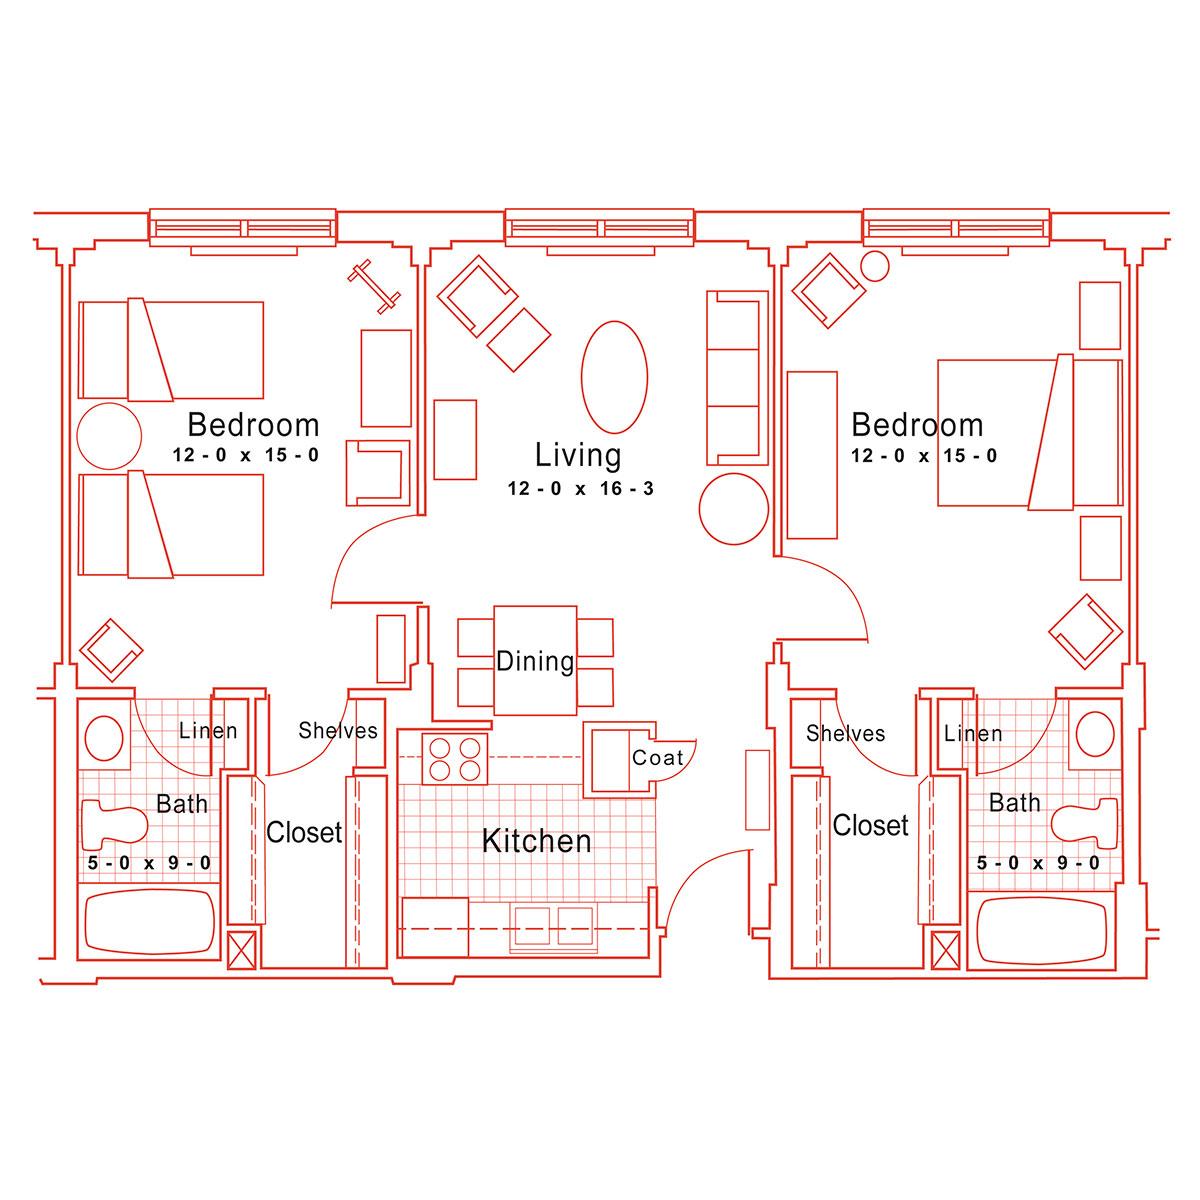 floor plans king sbridge retirement community retirement homes floor plans house of samples